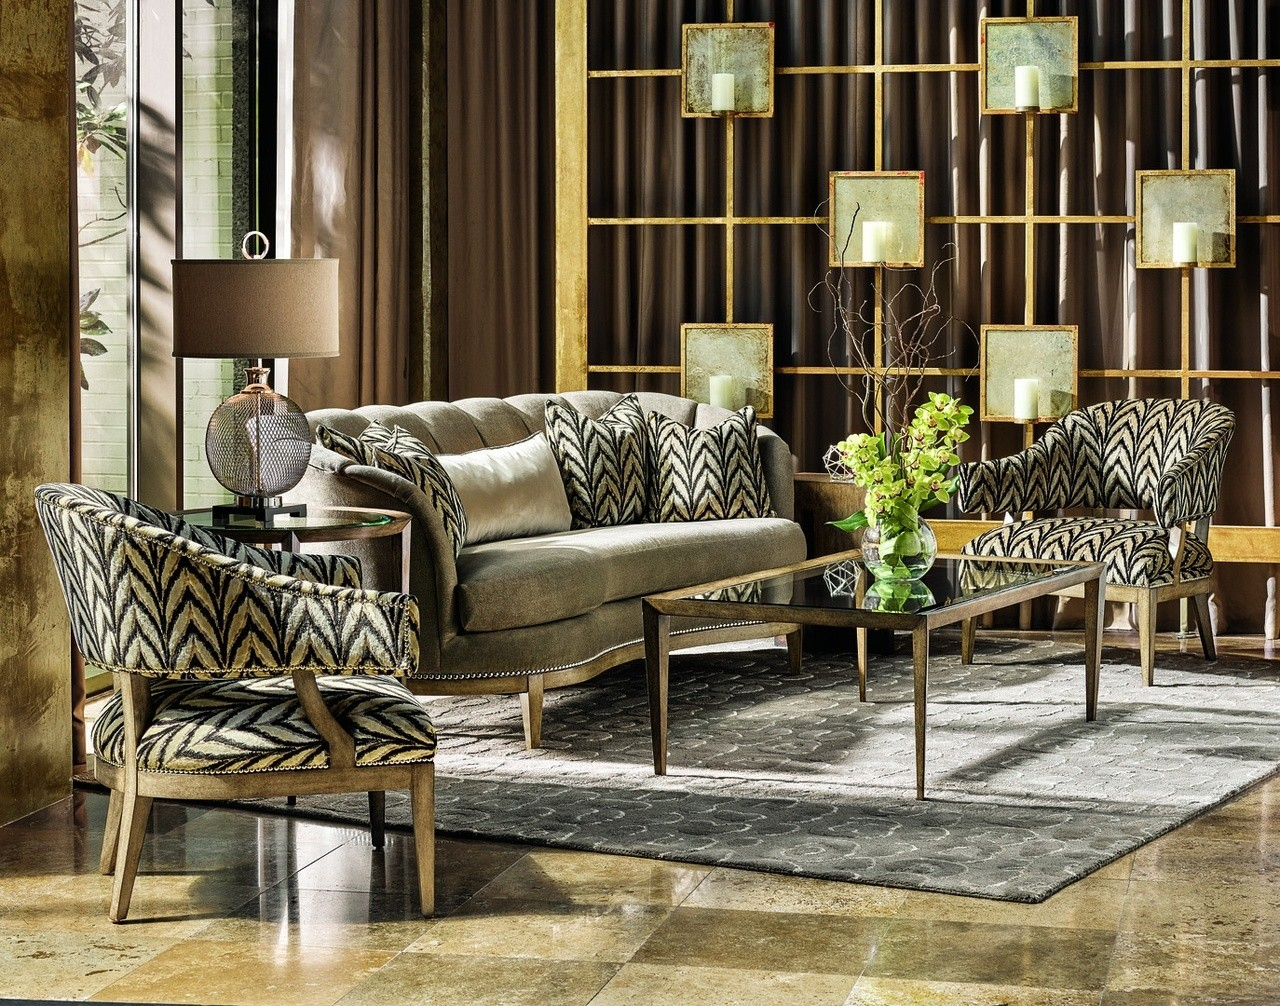 High End Modern Furniture: Classy High End Accent Chair From Our Modern Dakota